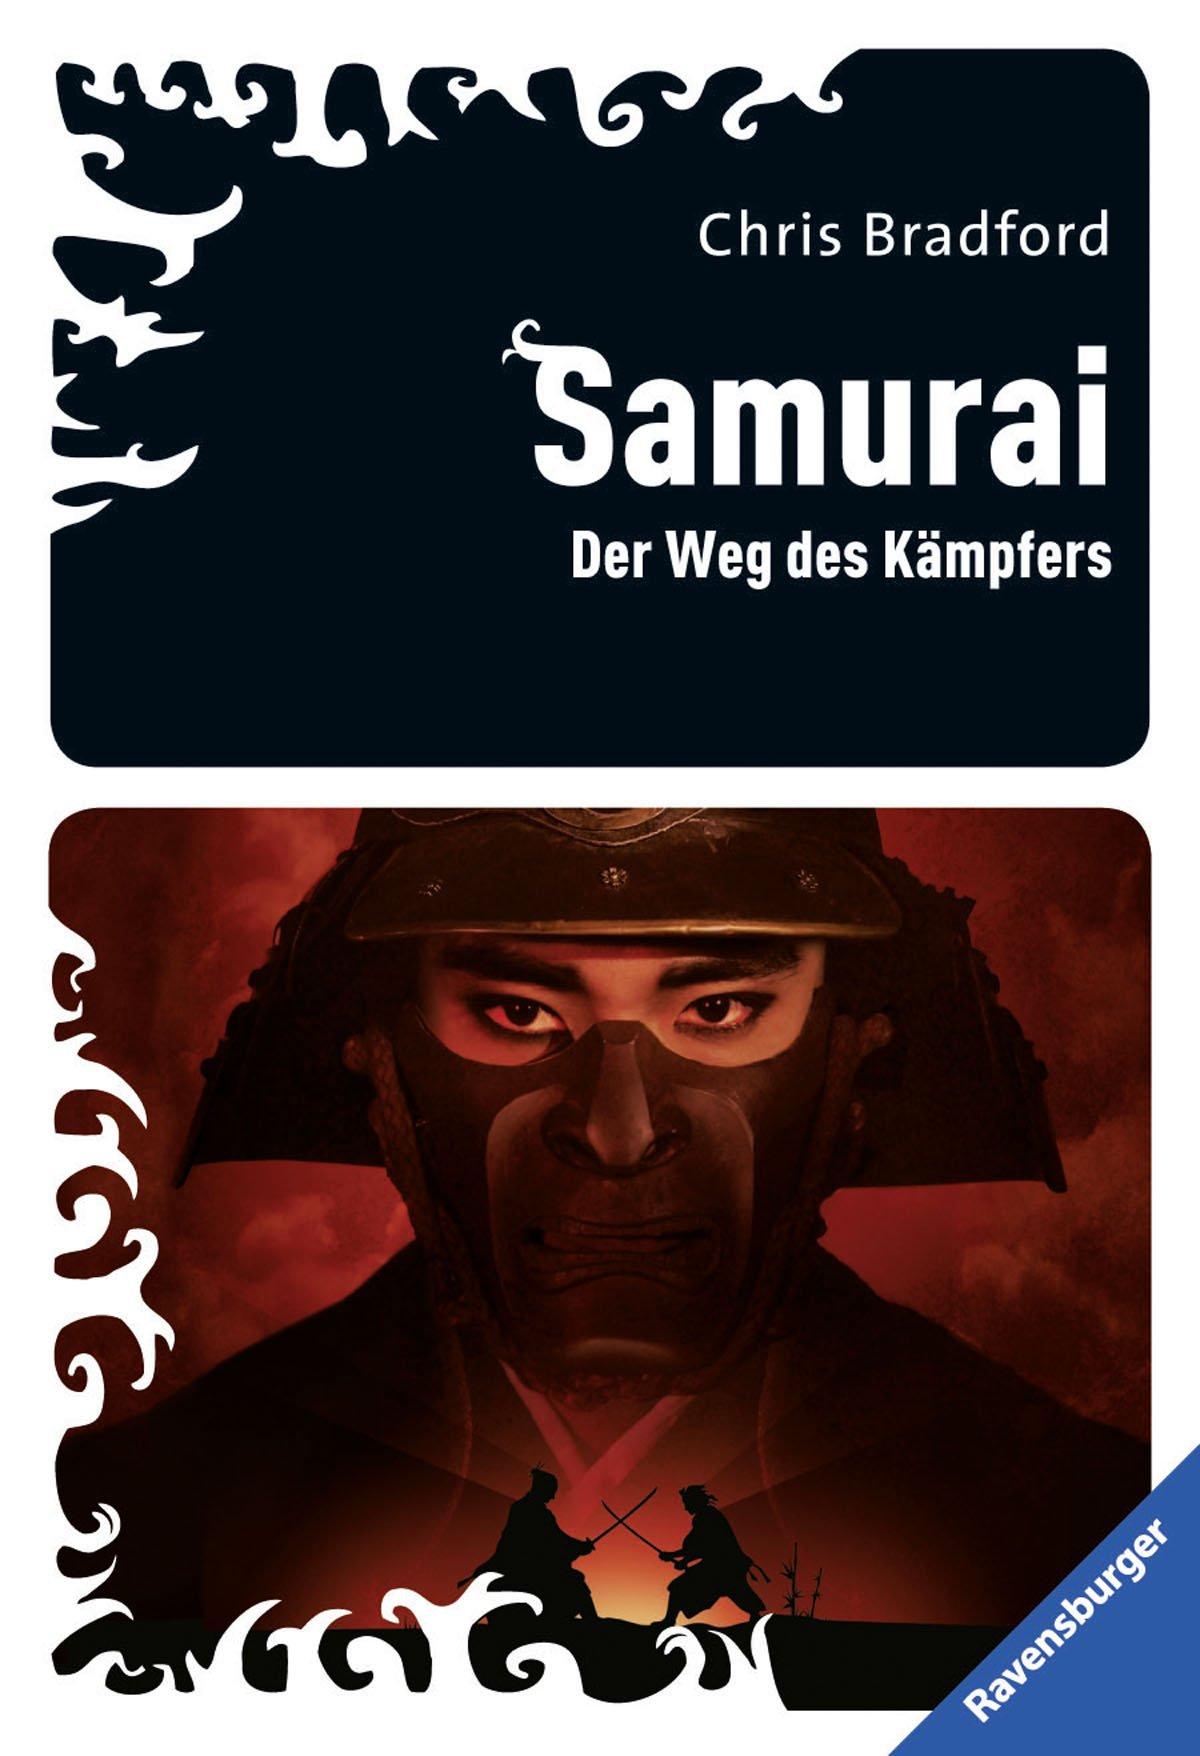 Der Weg des Kämpfers (Samurai)